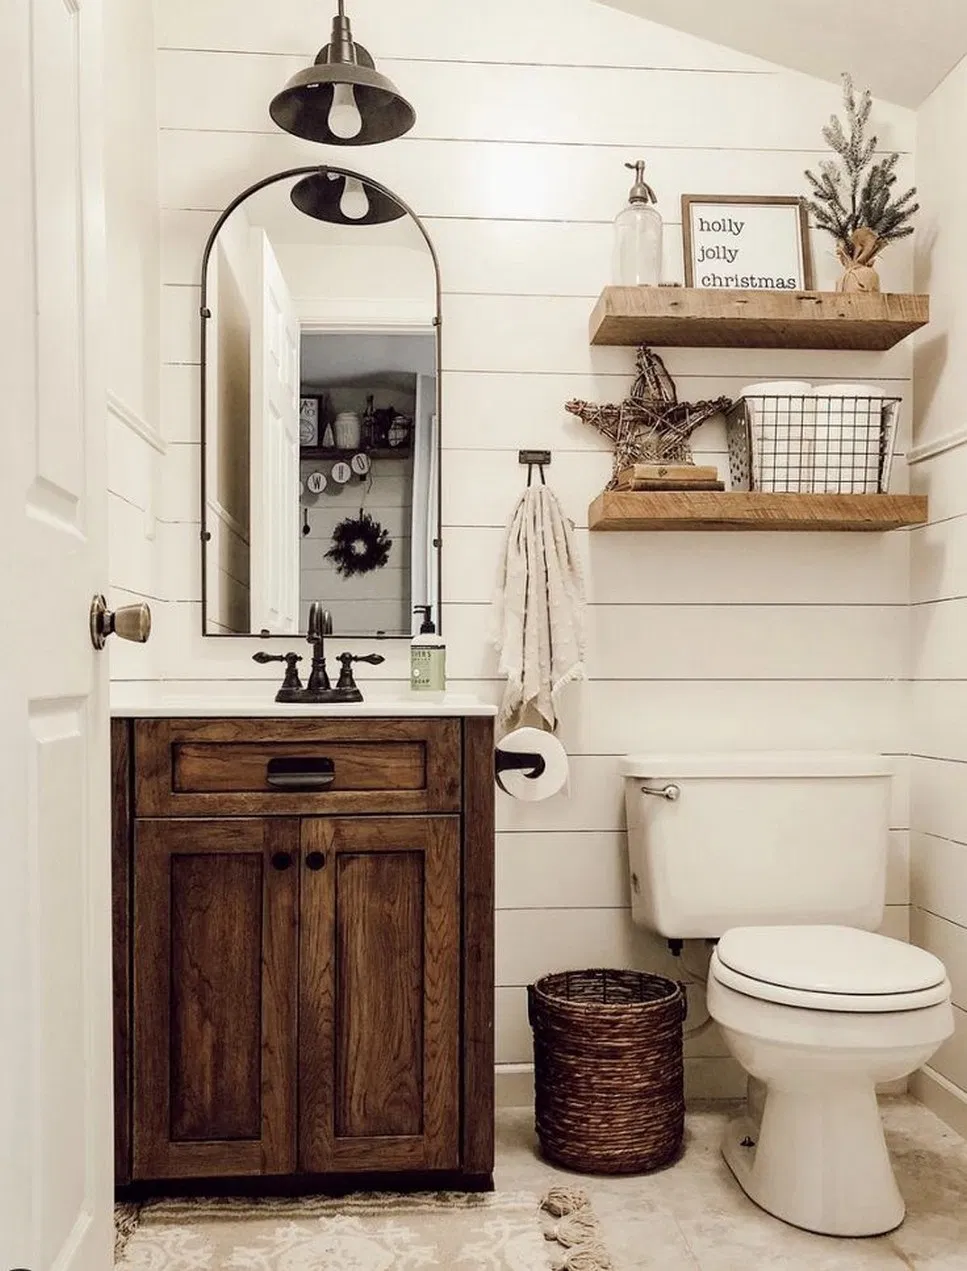 39 Good Bathroom Mirror Ideas To Reflect Your Style 11 Tendollarbux Com Bath Bath B Decoracao Banheiro Ideias Banheiros Modernos Moveis Para Banheiro